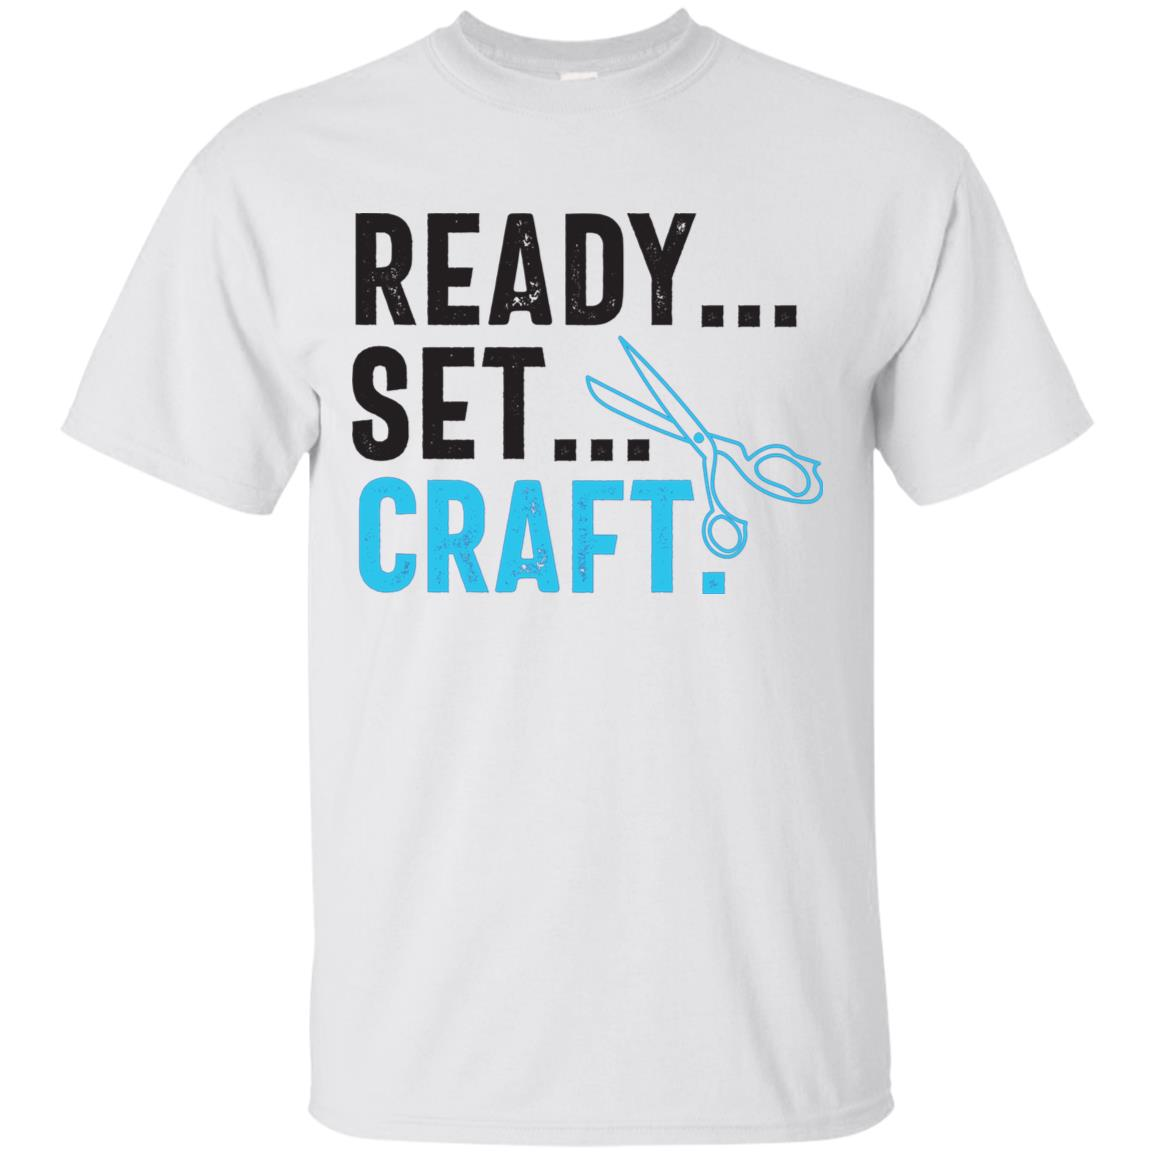 Funny Crafter Unisex – Ready, Set, Craft!-1 Unisex Short Sleeve